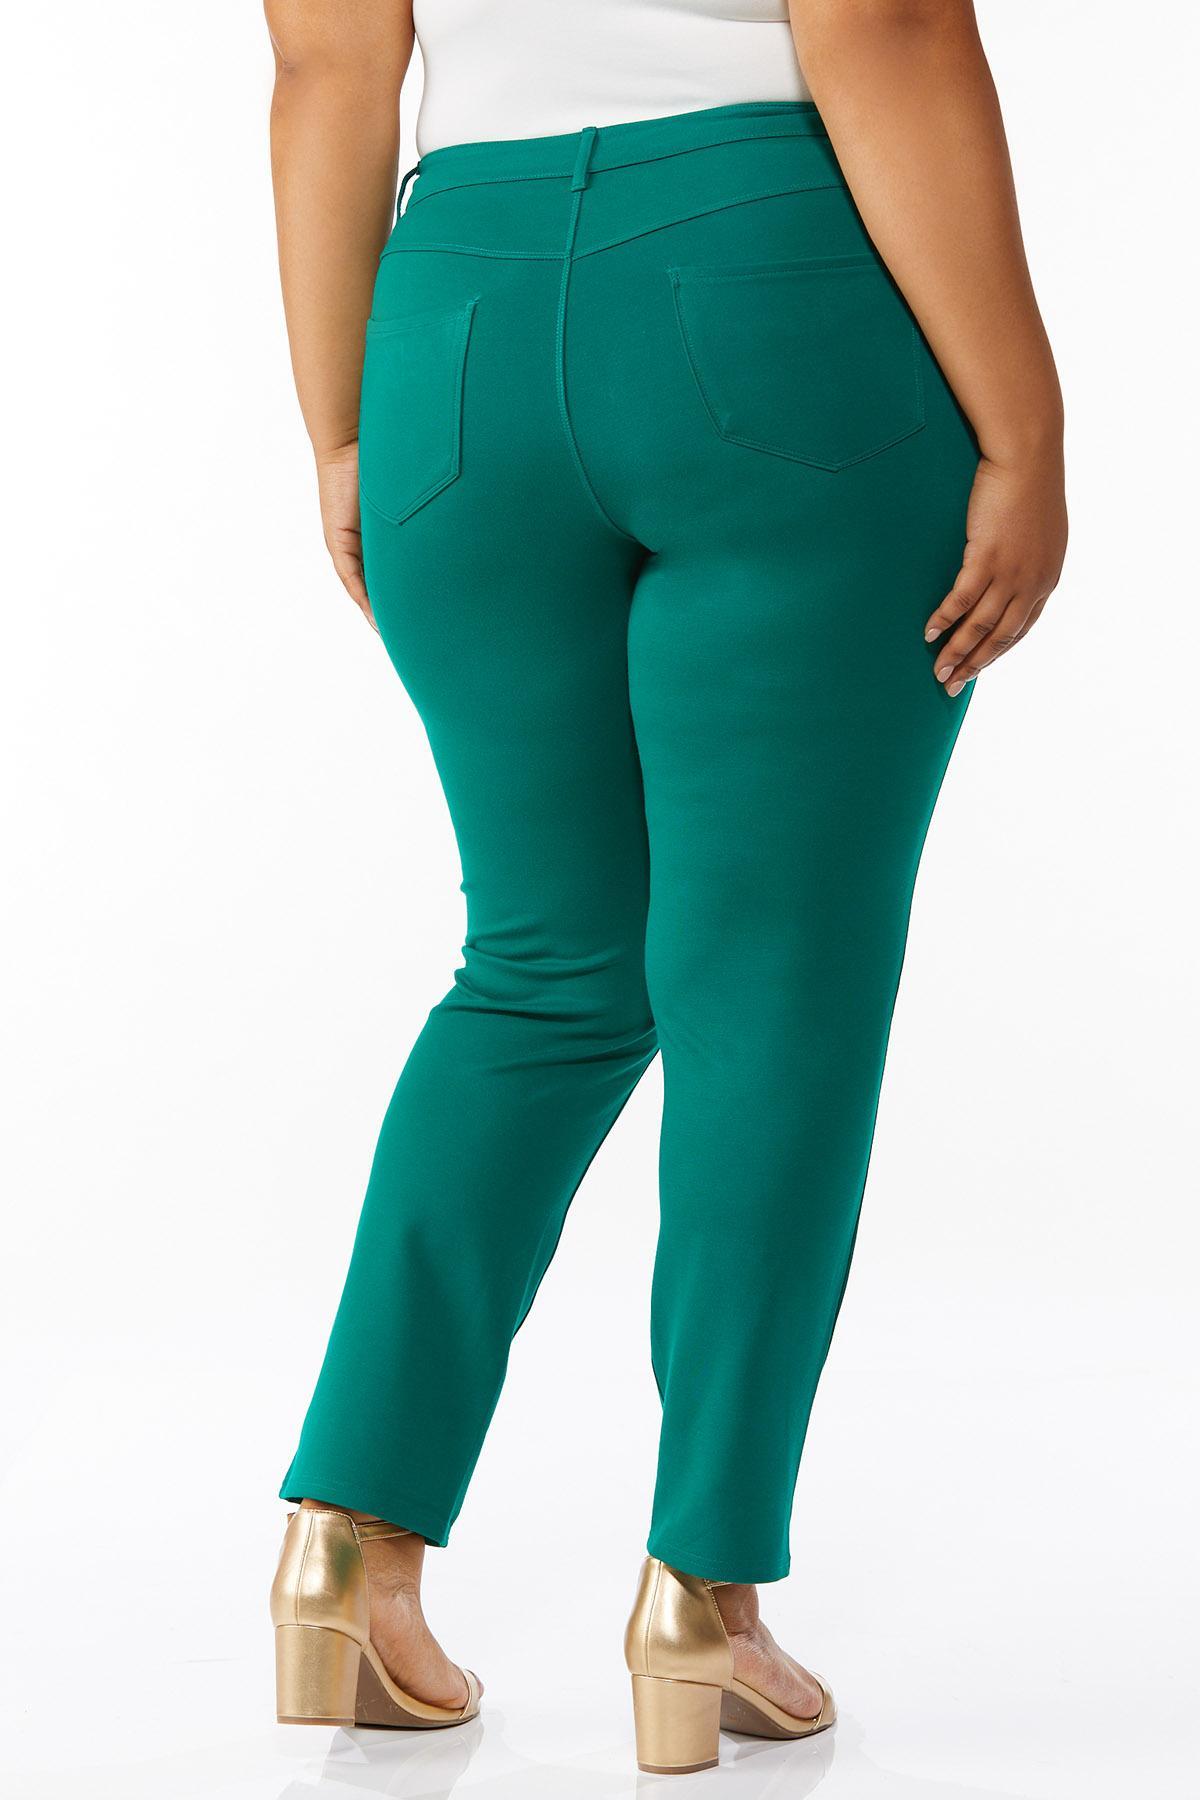 Plus Petite Skinny 5-Pocket Ponte Pants (Item #44623339)